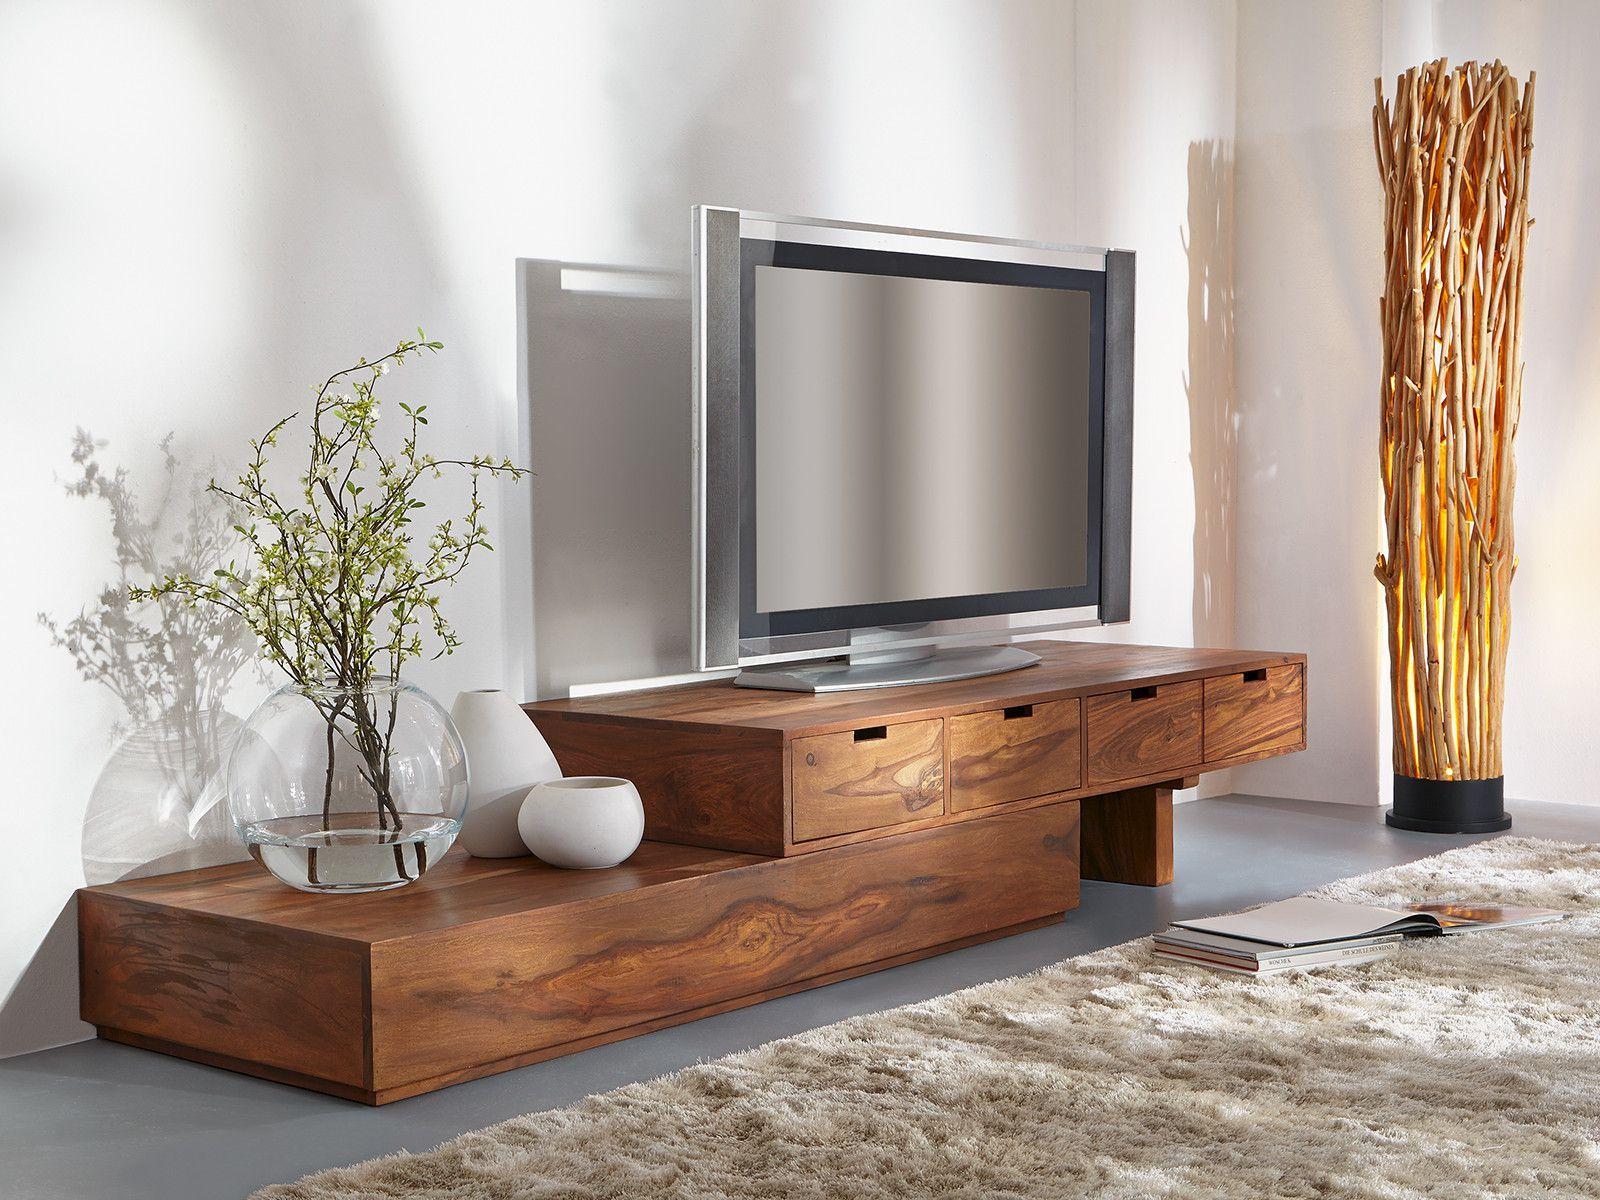 72 Anstandig Tv Bank Retro Wooden Tv Unit Living Room Tv Wall Living Room Tv Stand